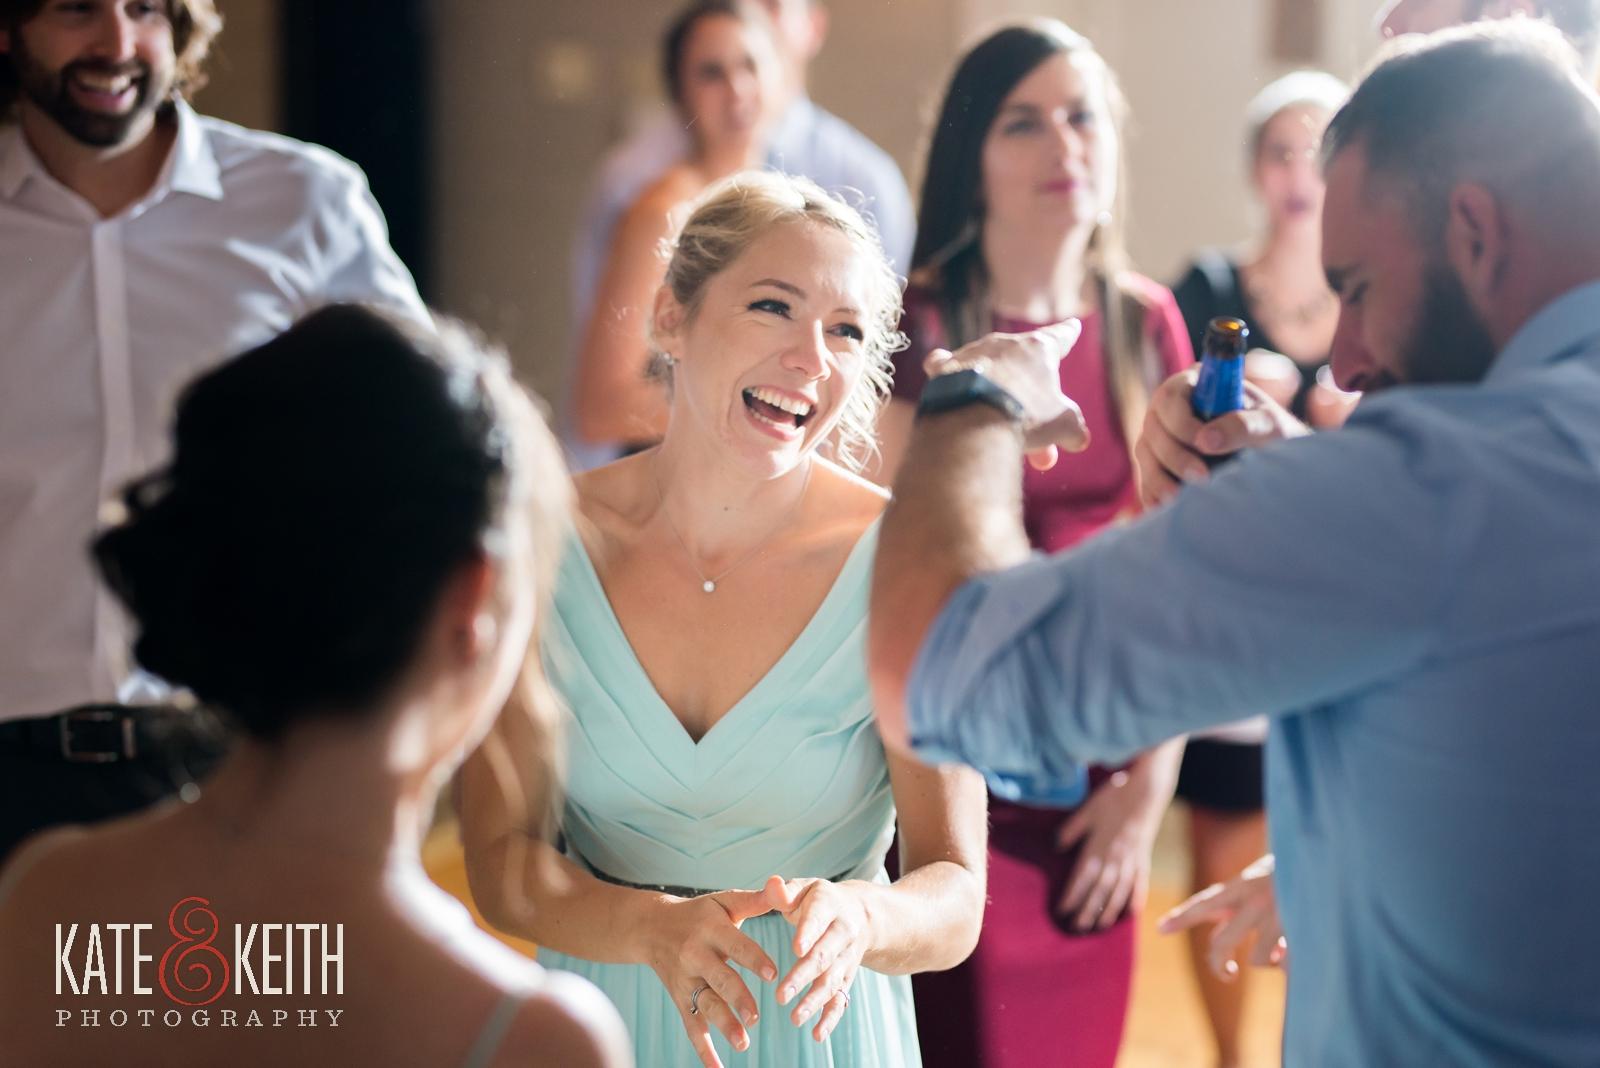 New Hampshire, Lakes Region, Lake Winnipesaukee, The Margate Resort, wedding, outdoor wedding, lakeside wedding, wedding reception, dance floor, bridesmaids dancing, candid wedding photos, candid wedding moments, candid photography